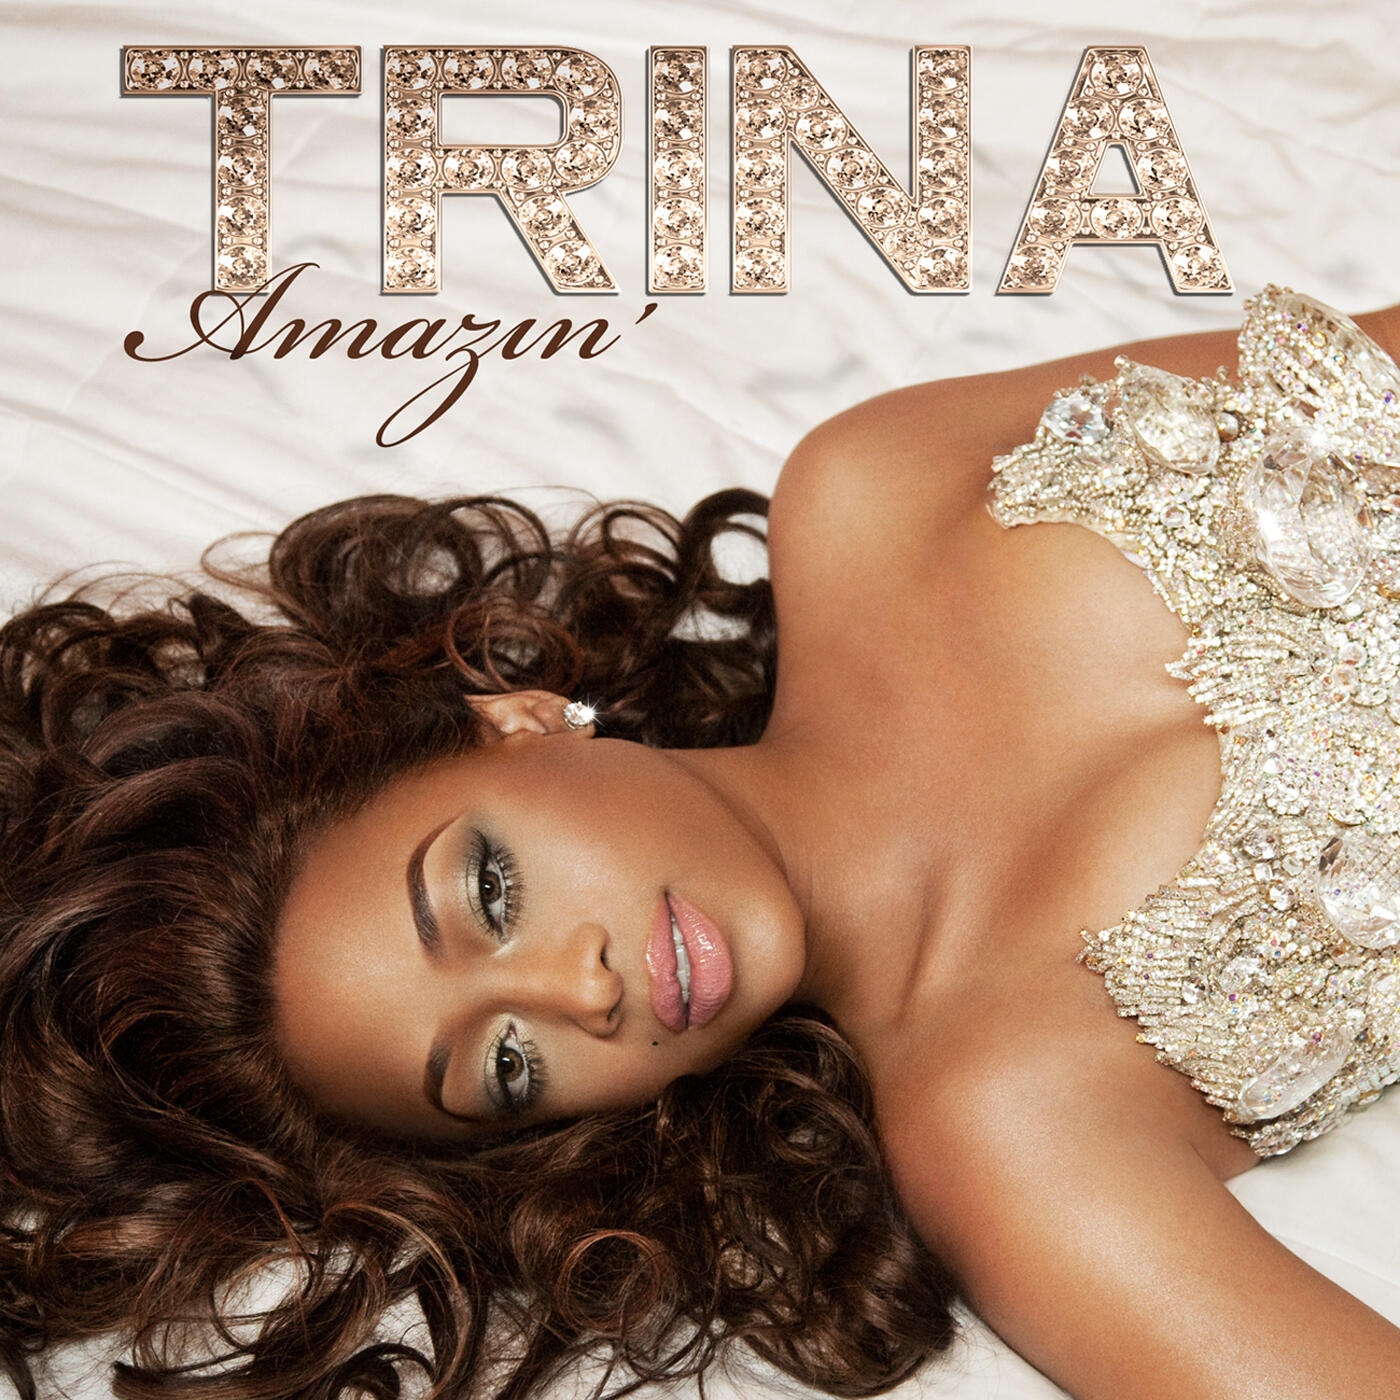 Trina Miami: Trina/Monica Radio: Listen To Free Music & Get The Latest